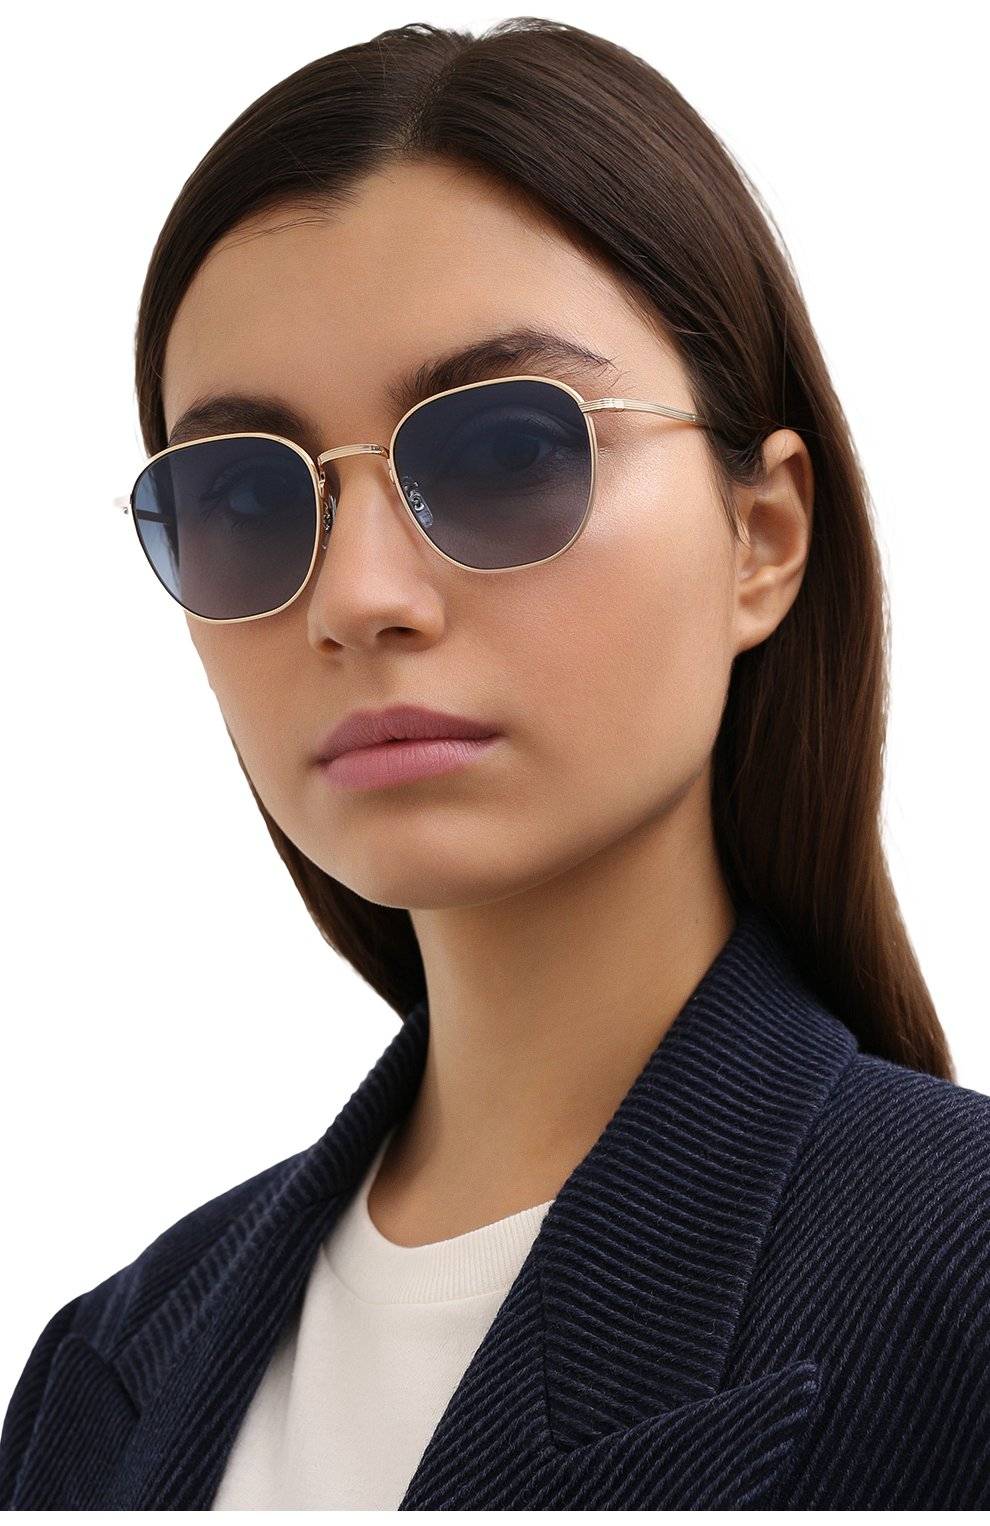 Женские солнцезащитные очки THE ROW X OLIVER PEOPLES синего цвета, арт. 1230ST-5035Q8 | Фото 2 (Тип очков: С/з; Очки форма: Круглые; Оптика Гендер: оптика-унисекс)